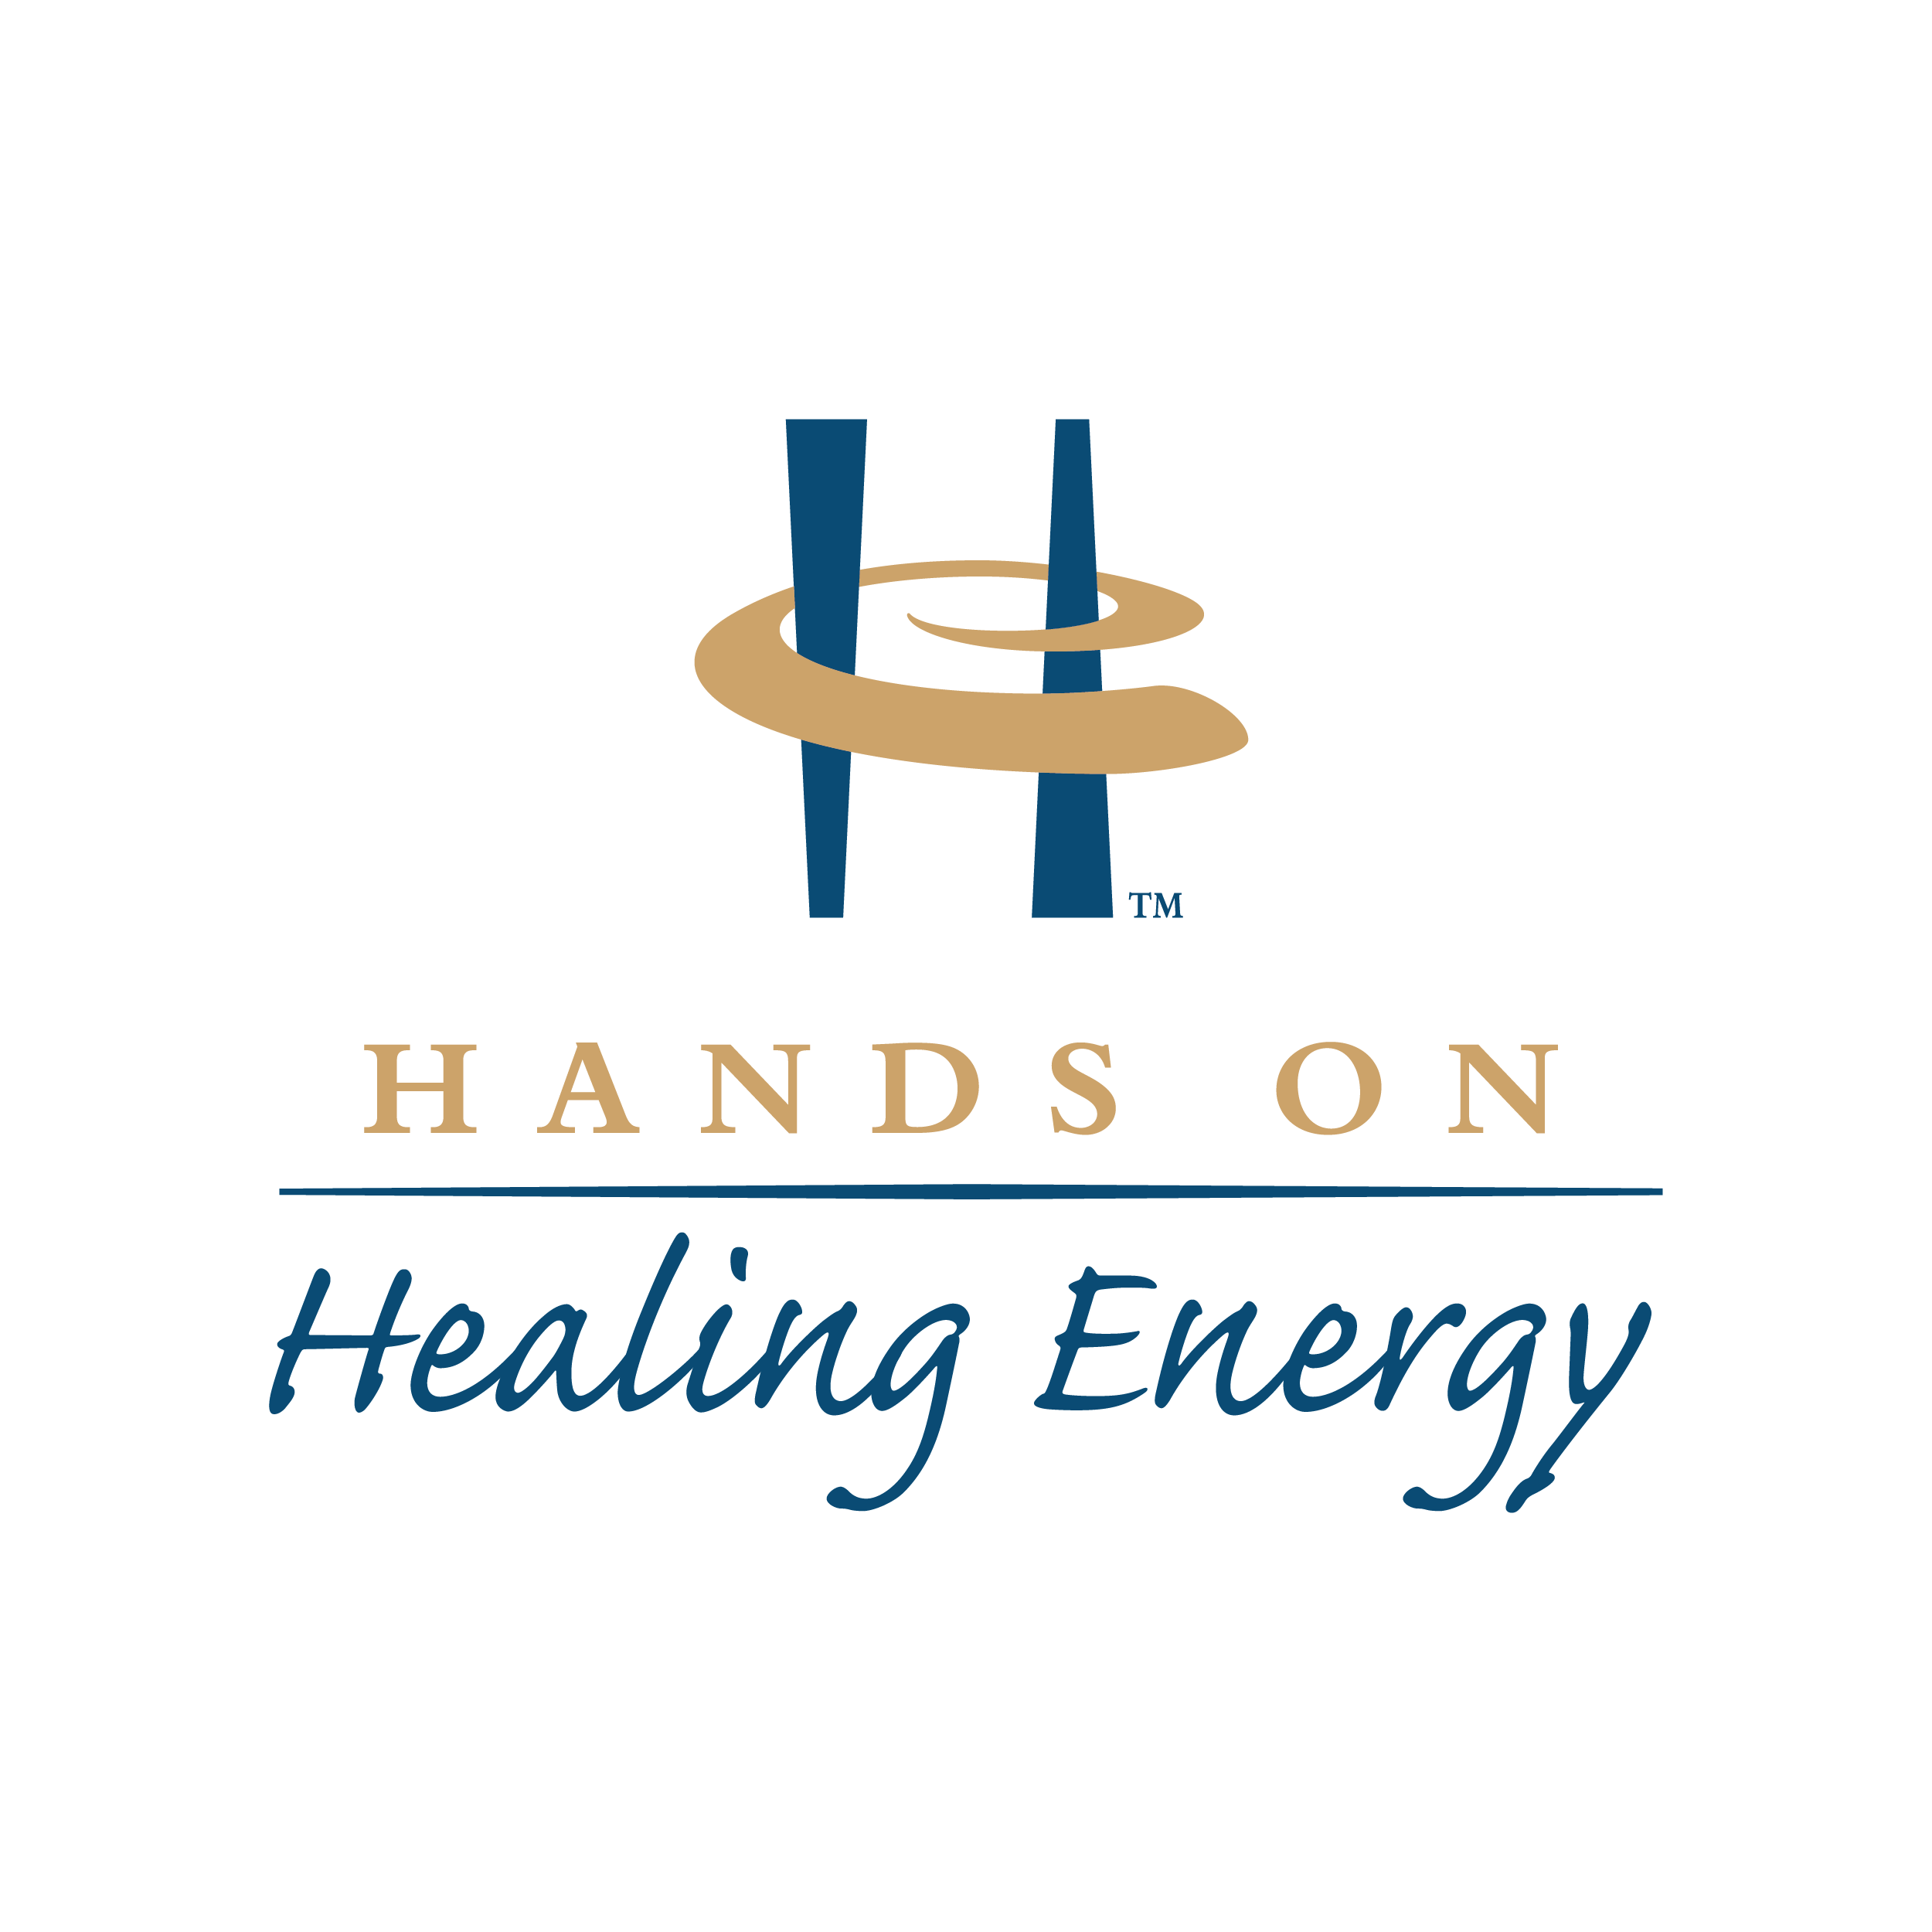 Hands on Healing Energy